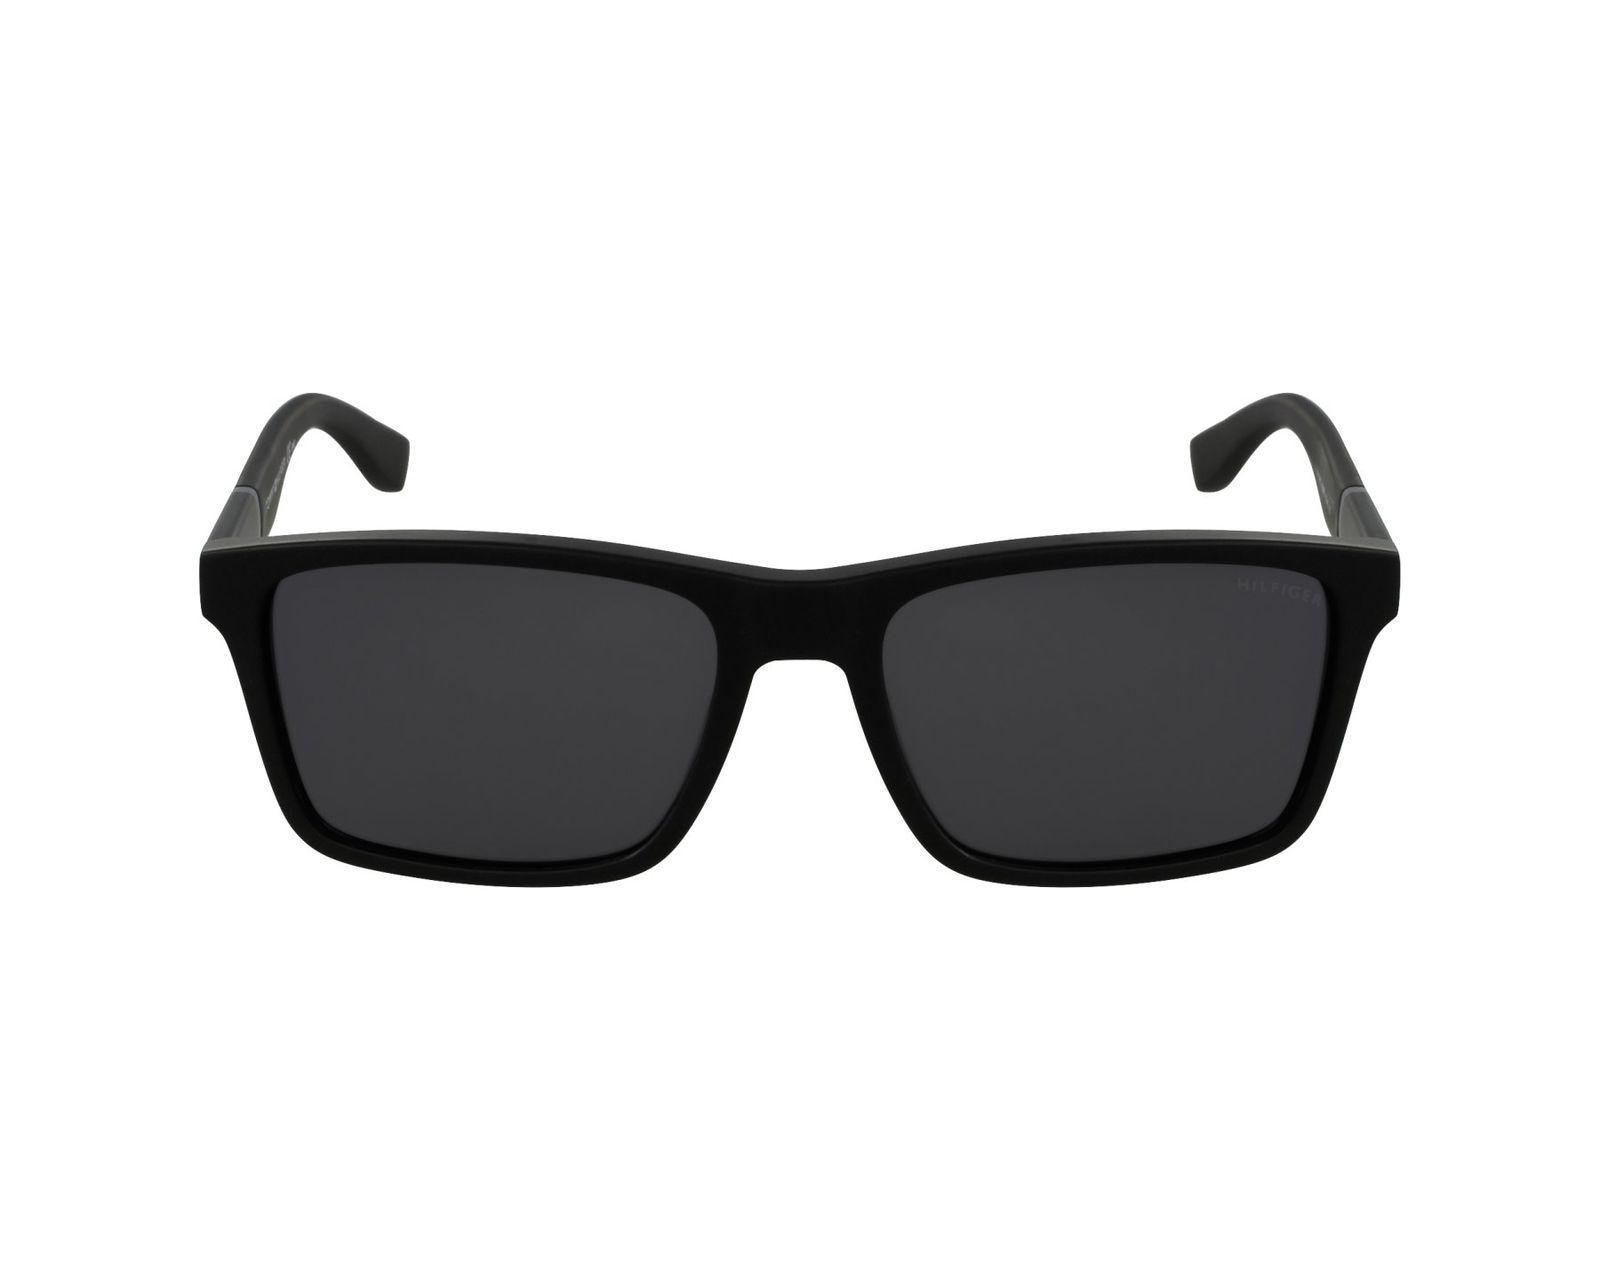 Óculos de Sol Tommy Hilfiger TH1405 S KUNP9 - Omega Ótica e Relojoaria 7b8583dc1e